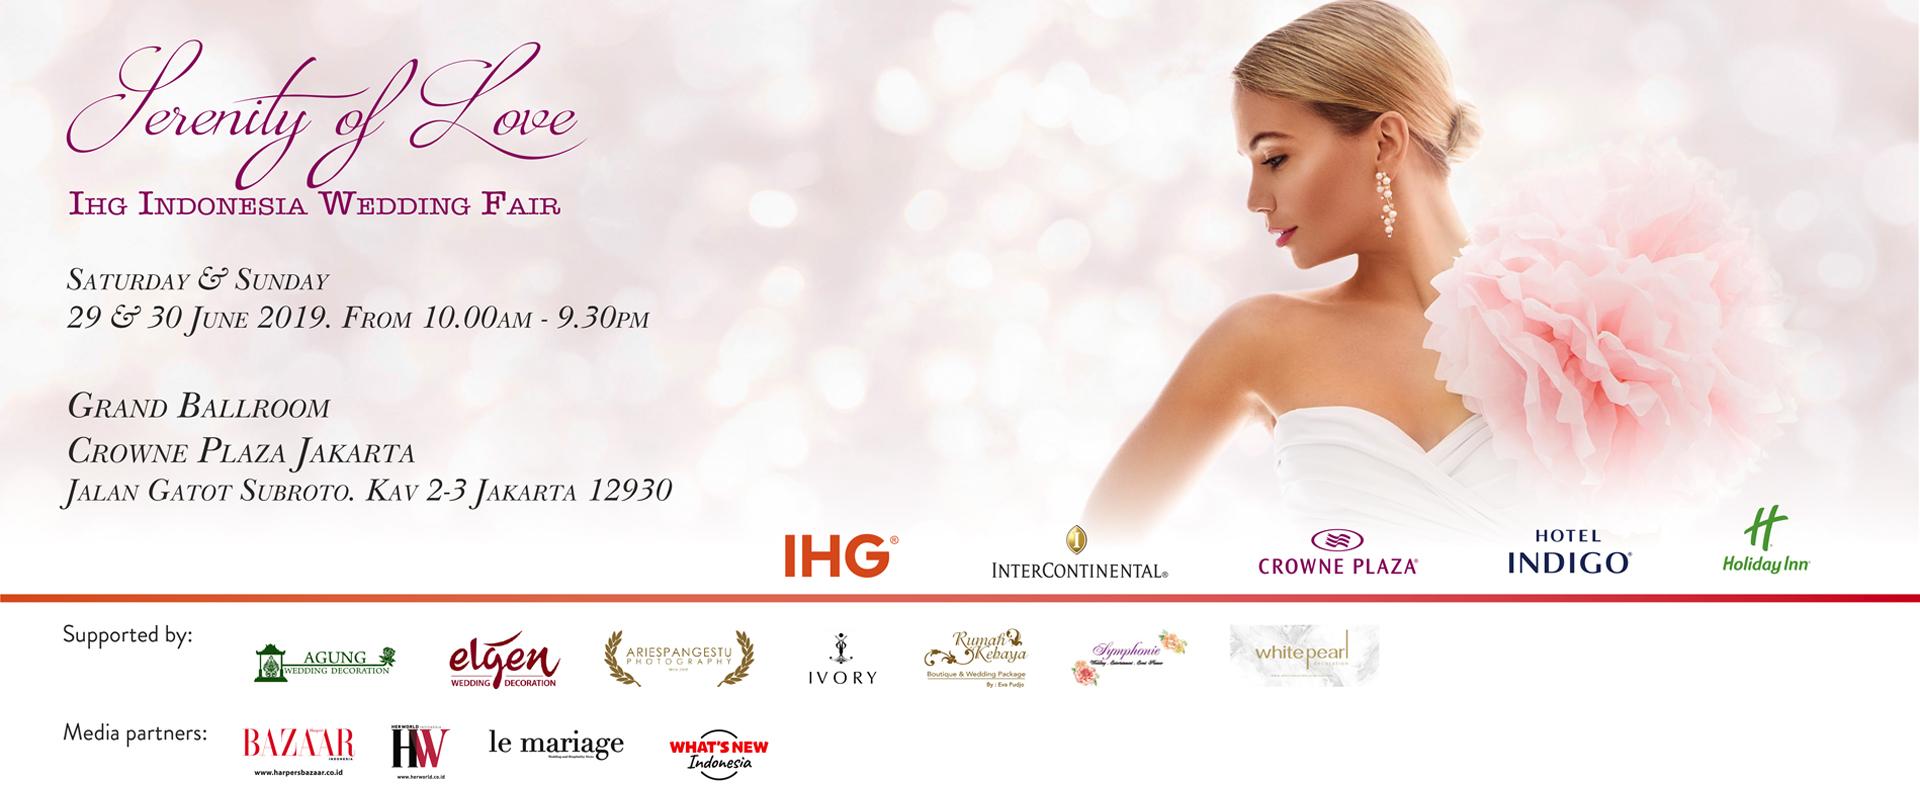 IHG Indonesia Wedding Fair